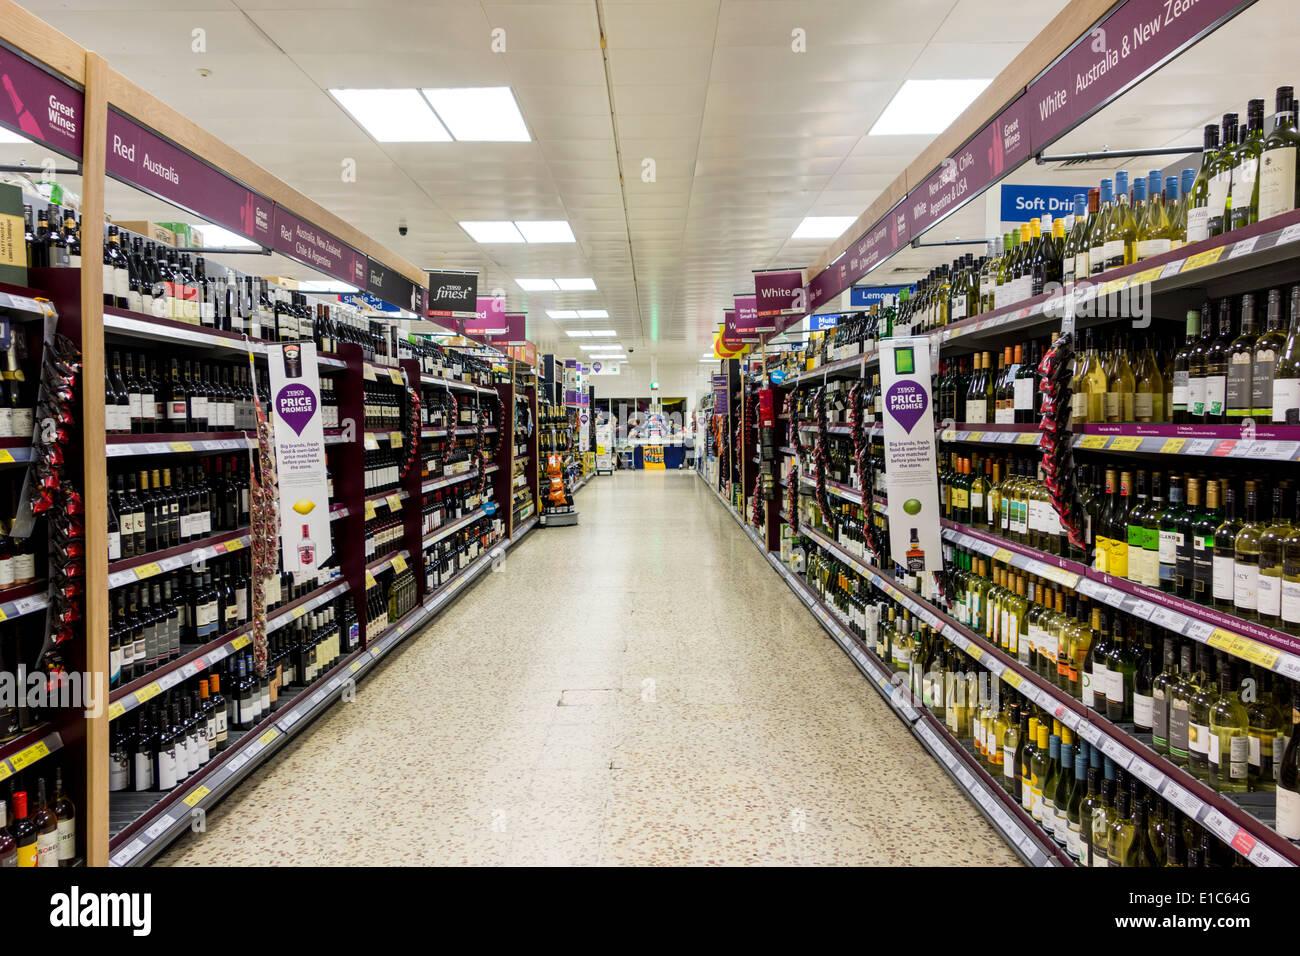 Wine deals uk supermarkets